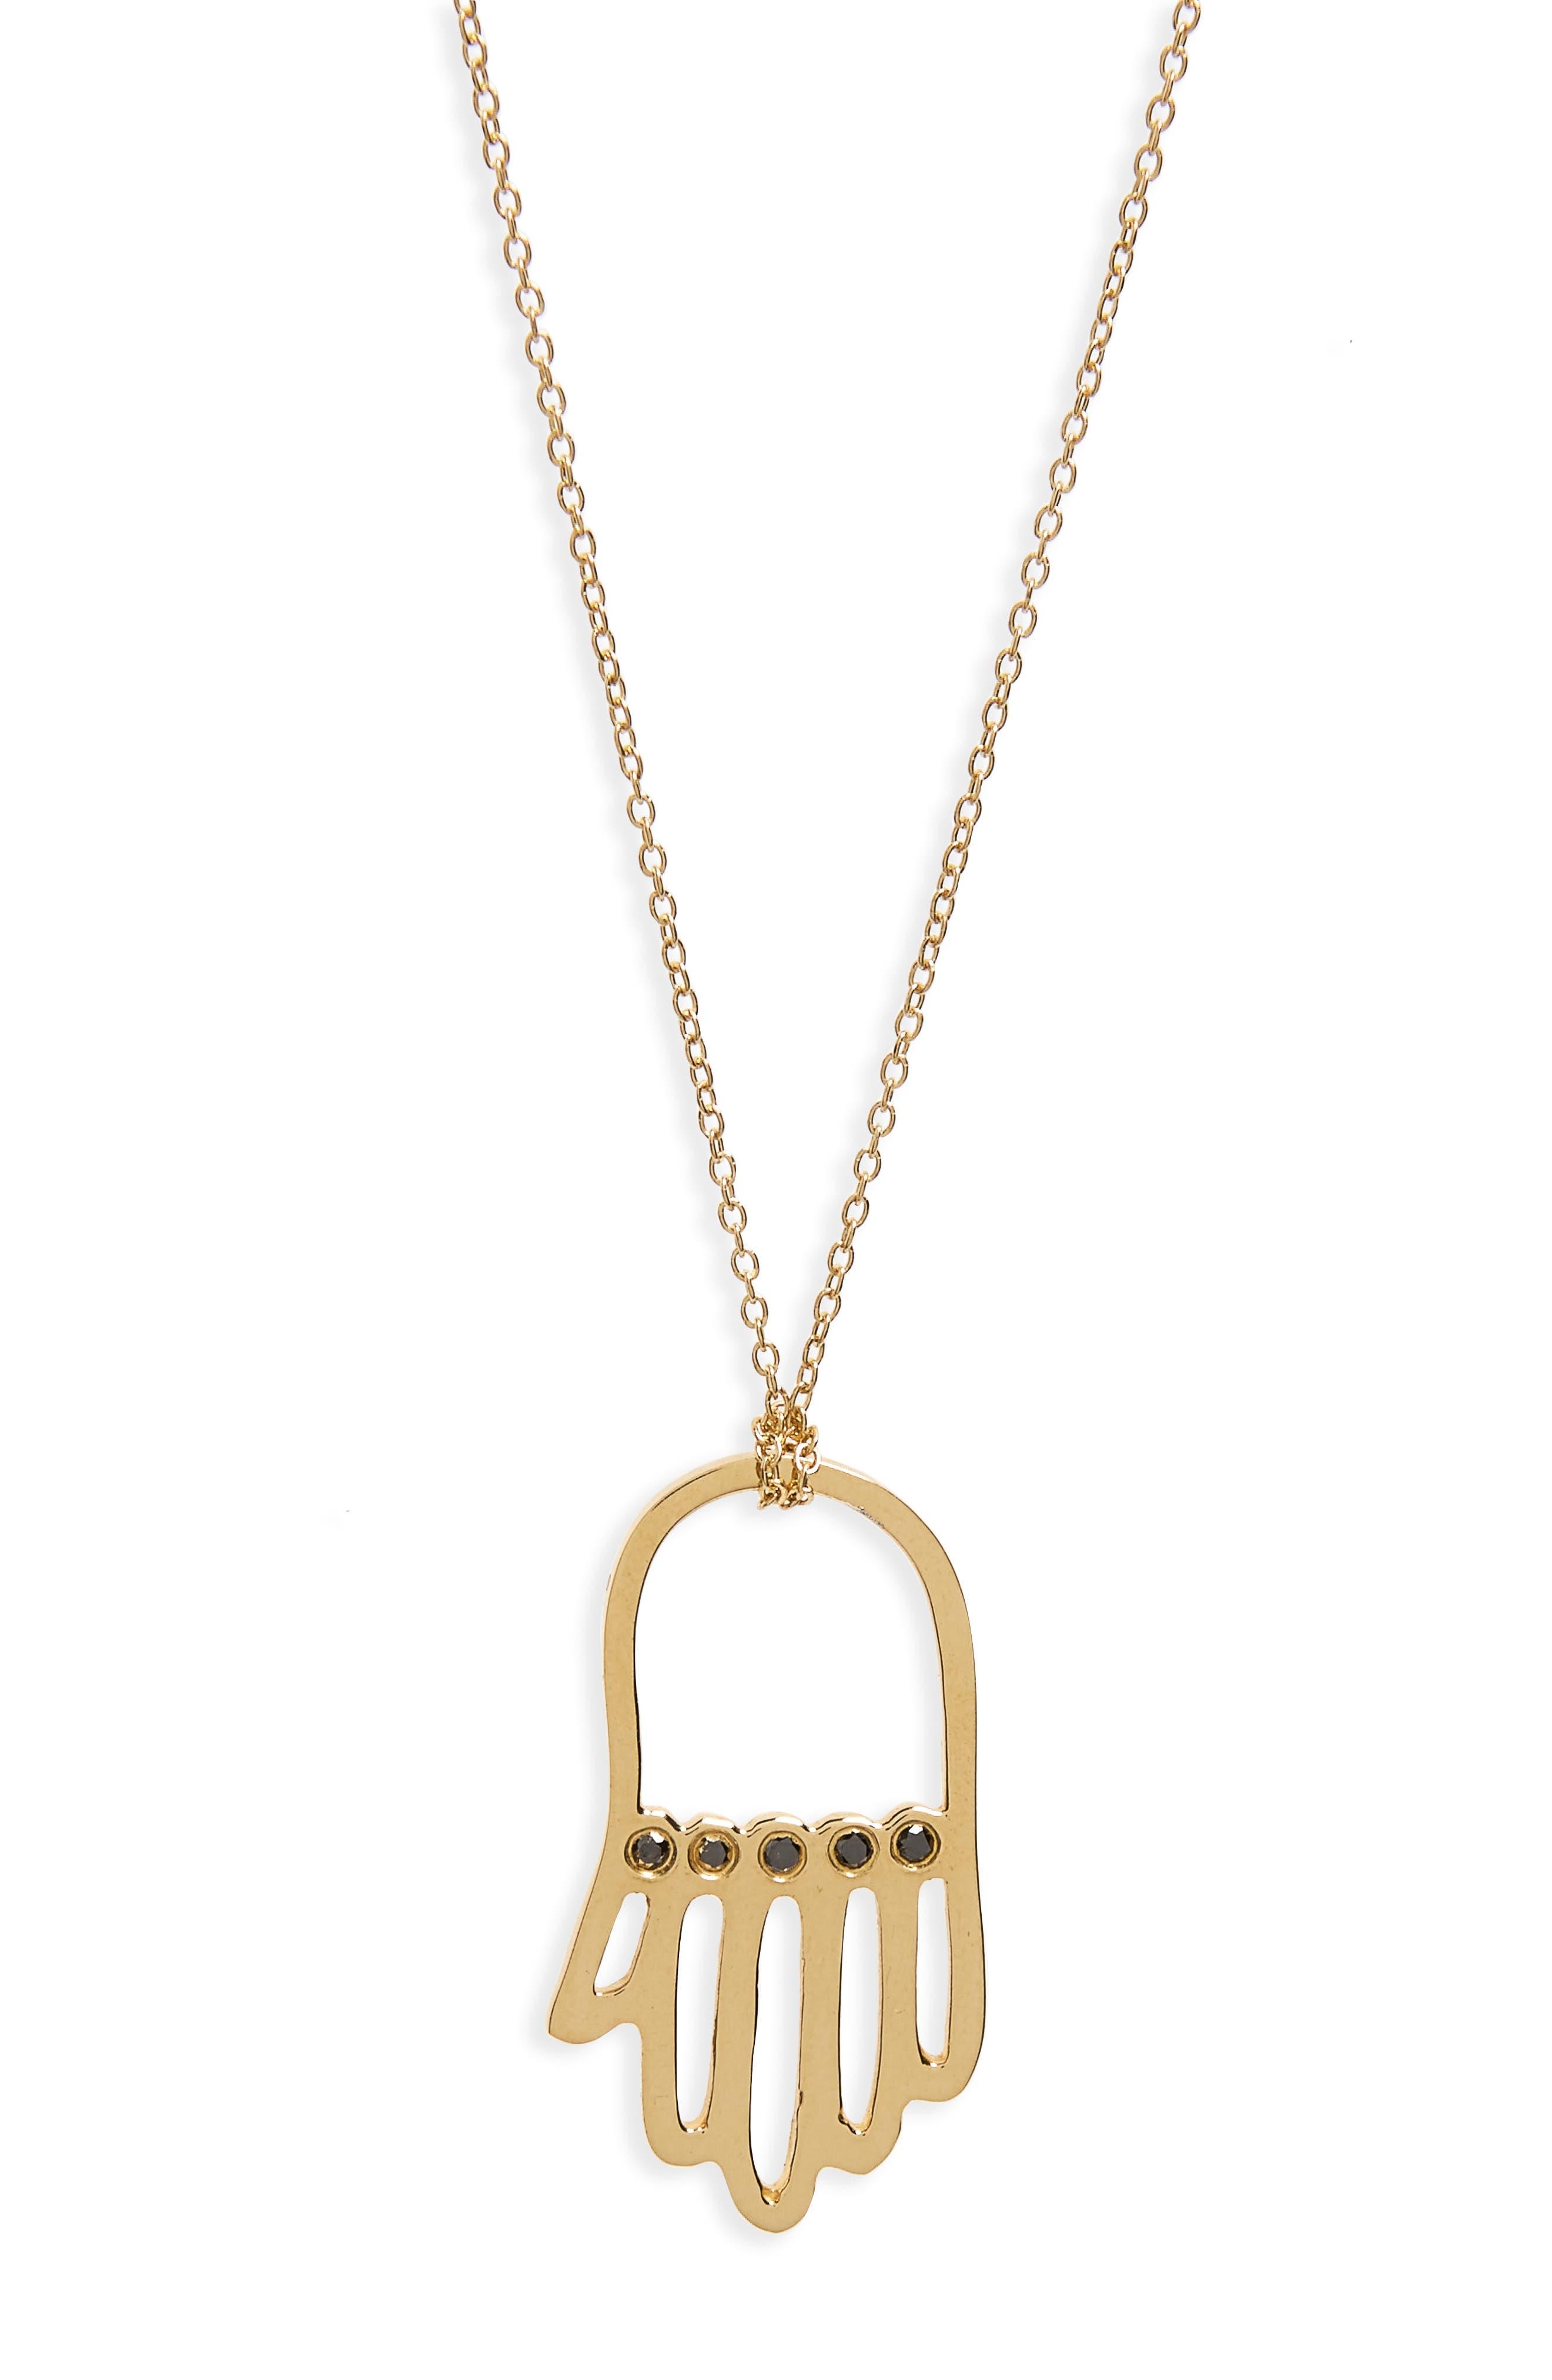 ICONERY X Rashida Jones Black Diamond Hamsa Pendant Necklace in Yellow Gold